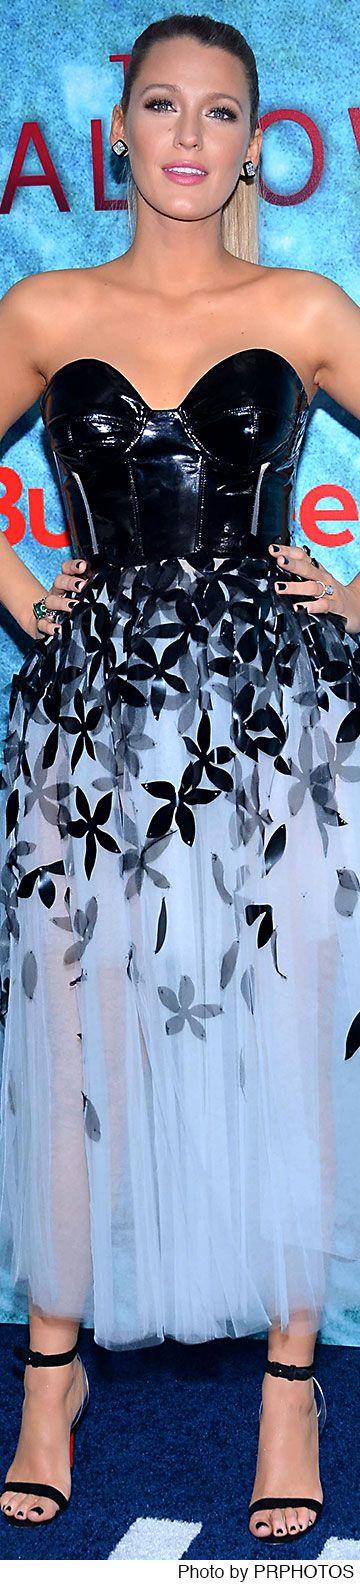 Blake Lively wearing Carolina Herrera dress - The Shallows New York Premiere - 06/21/2016